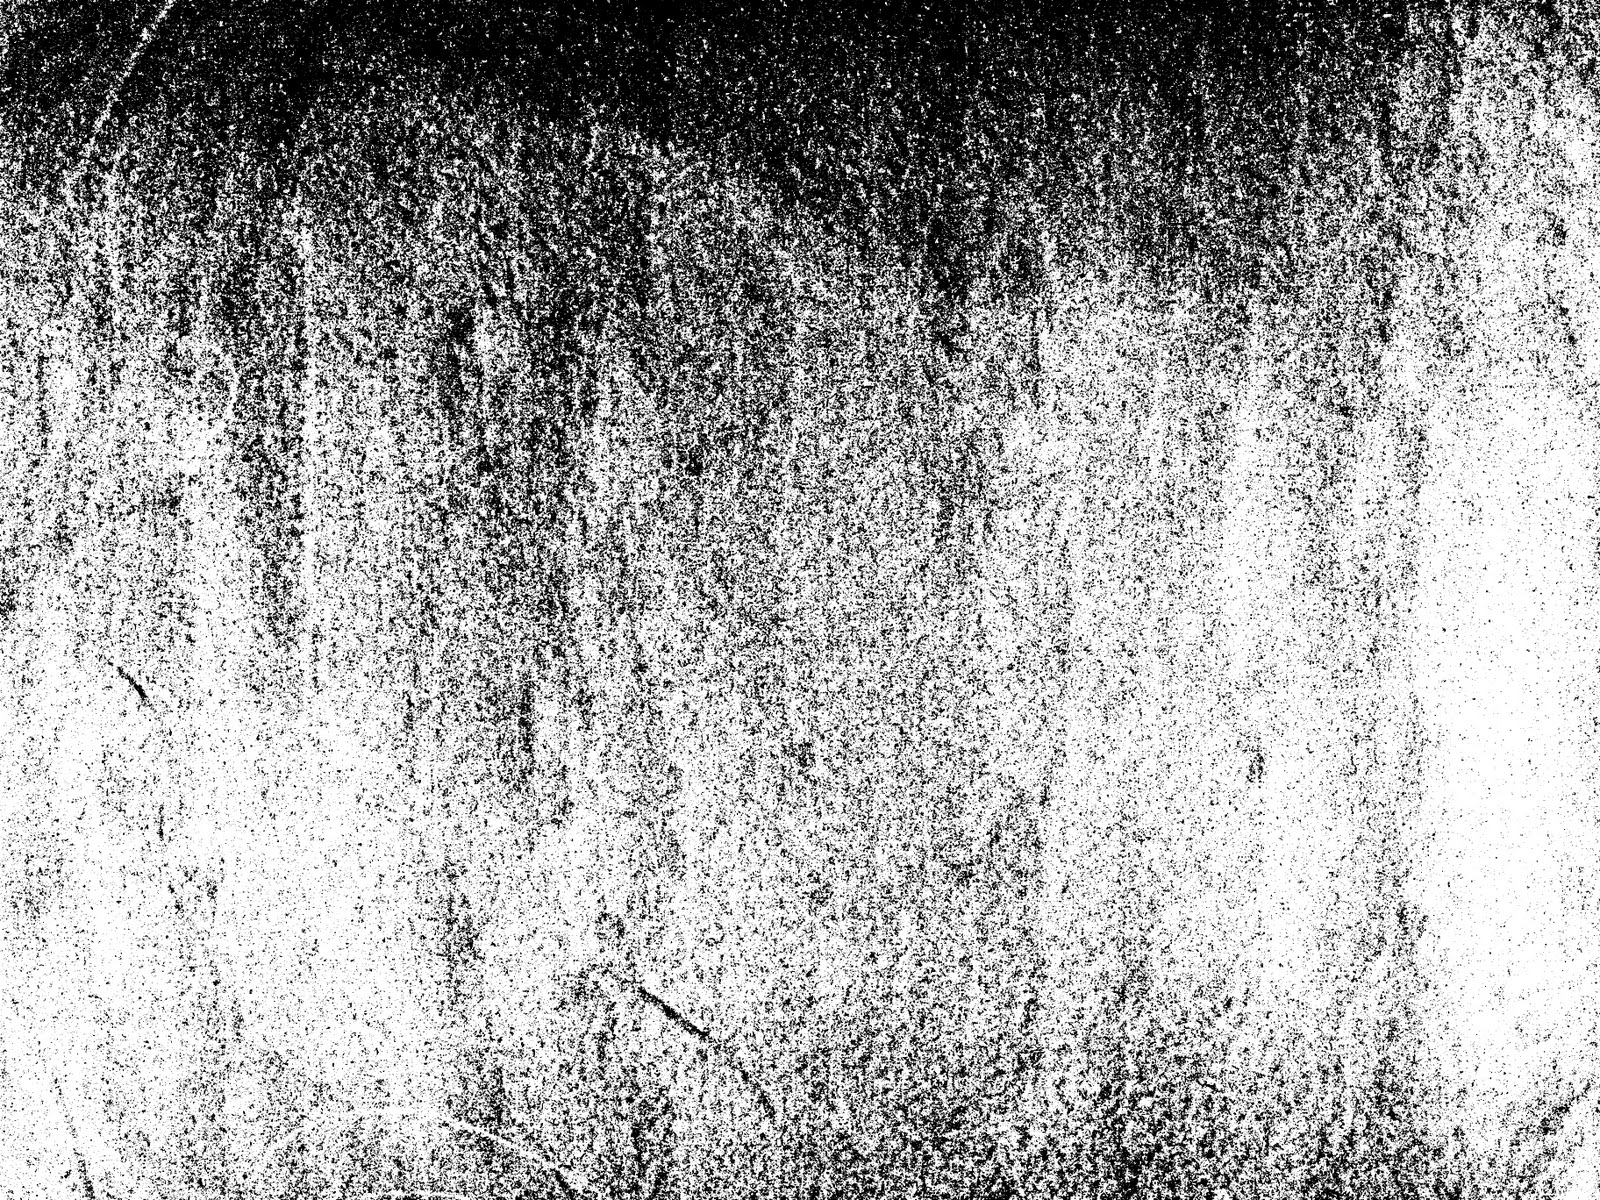 Skin Noise | Texture Bank: texturebank.blogspot.com/2011/12/skin-noise.html#!